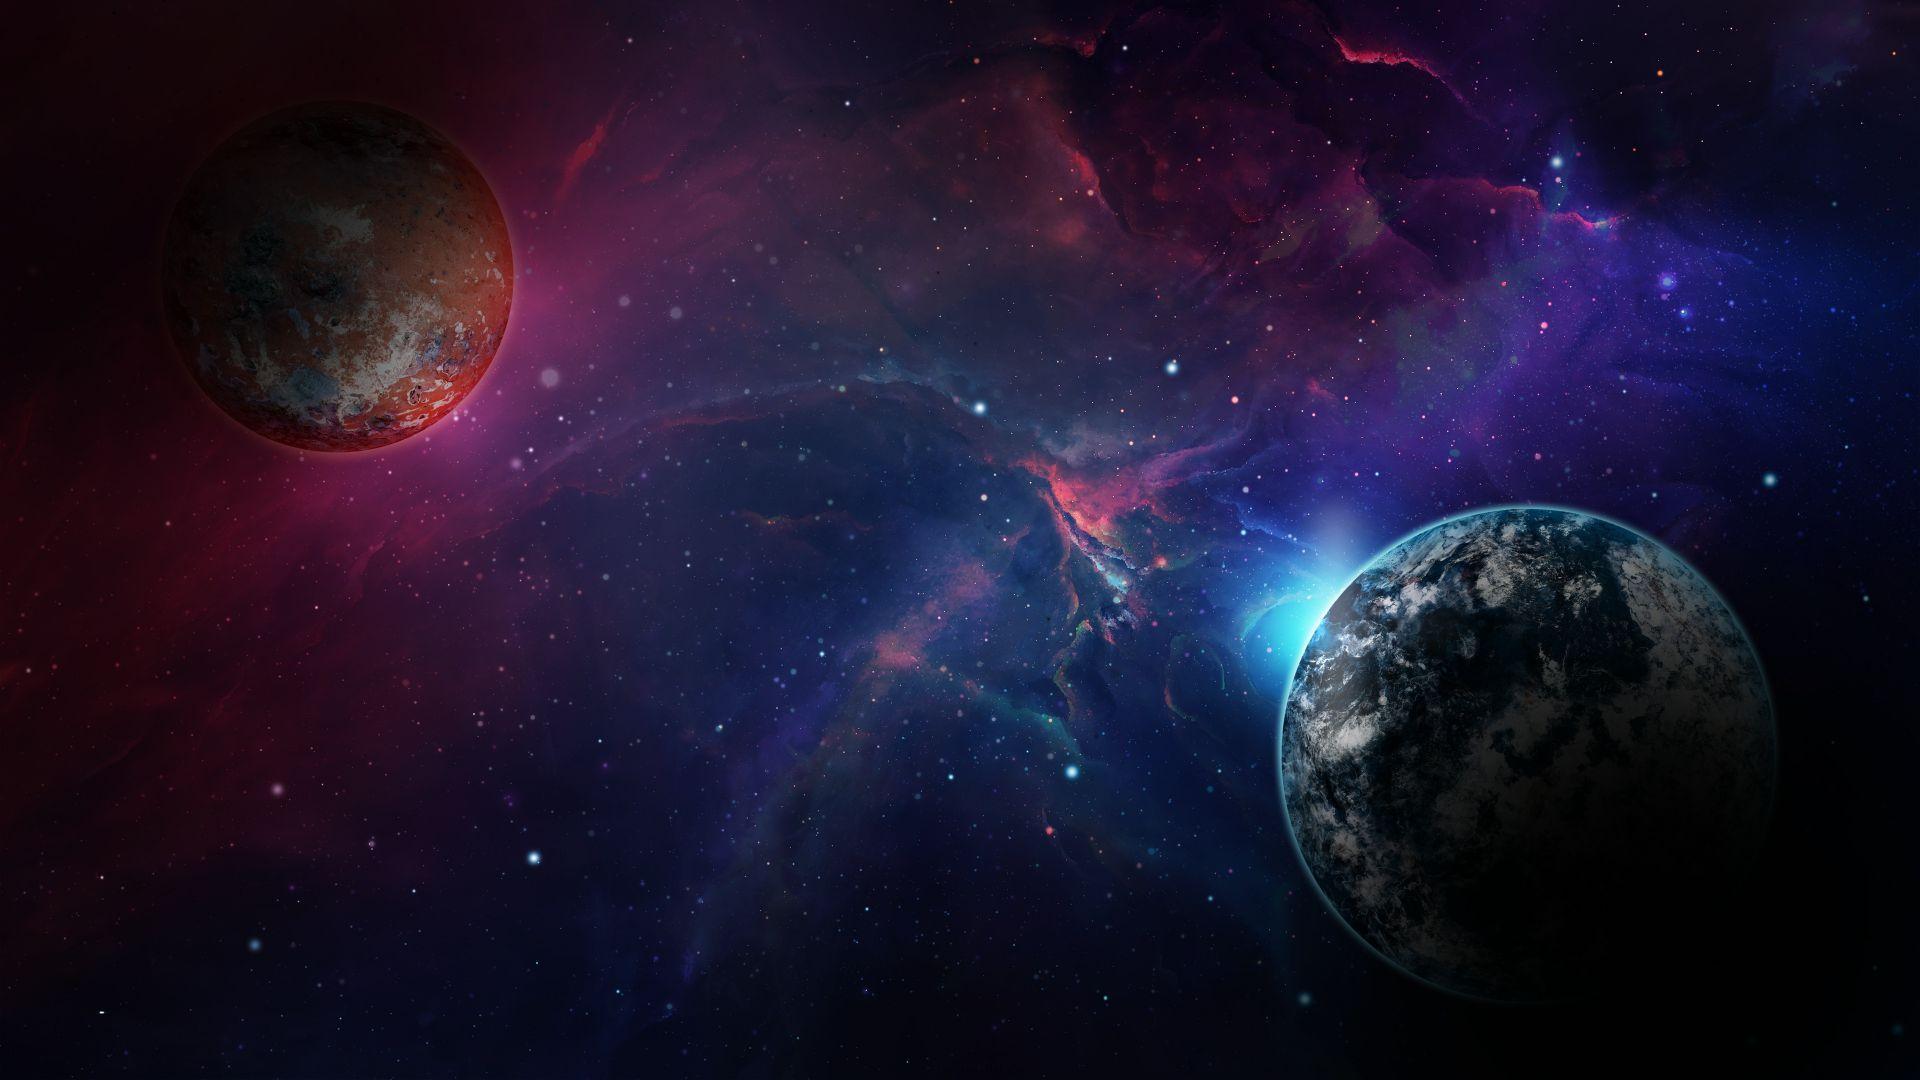 space, galaxy, planet, 4k horizontal in 2019 Wallpaper